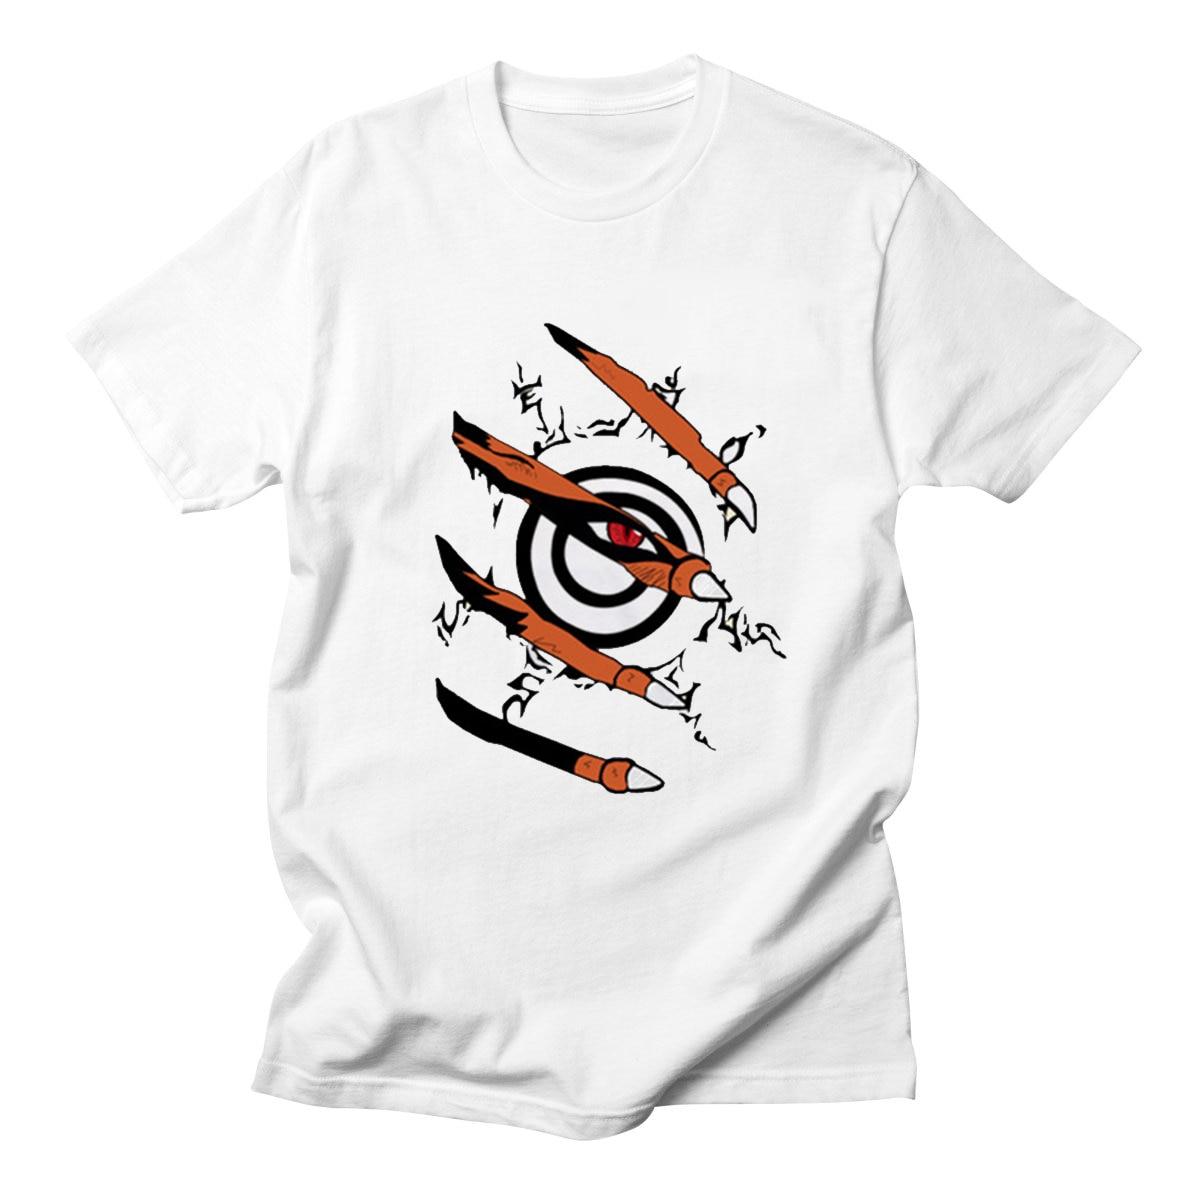 US $5 23 16% OFF|2019 Naruto Boruto Eye T Shirt Men Uchiha Itachi Uzumaki  Sasuke Kakashi Gaara Japan Anime Fuuny Tees Top T shirt-in T-Shirts from